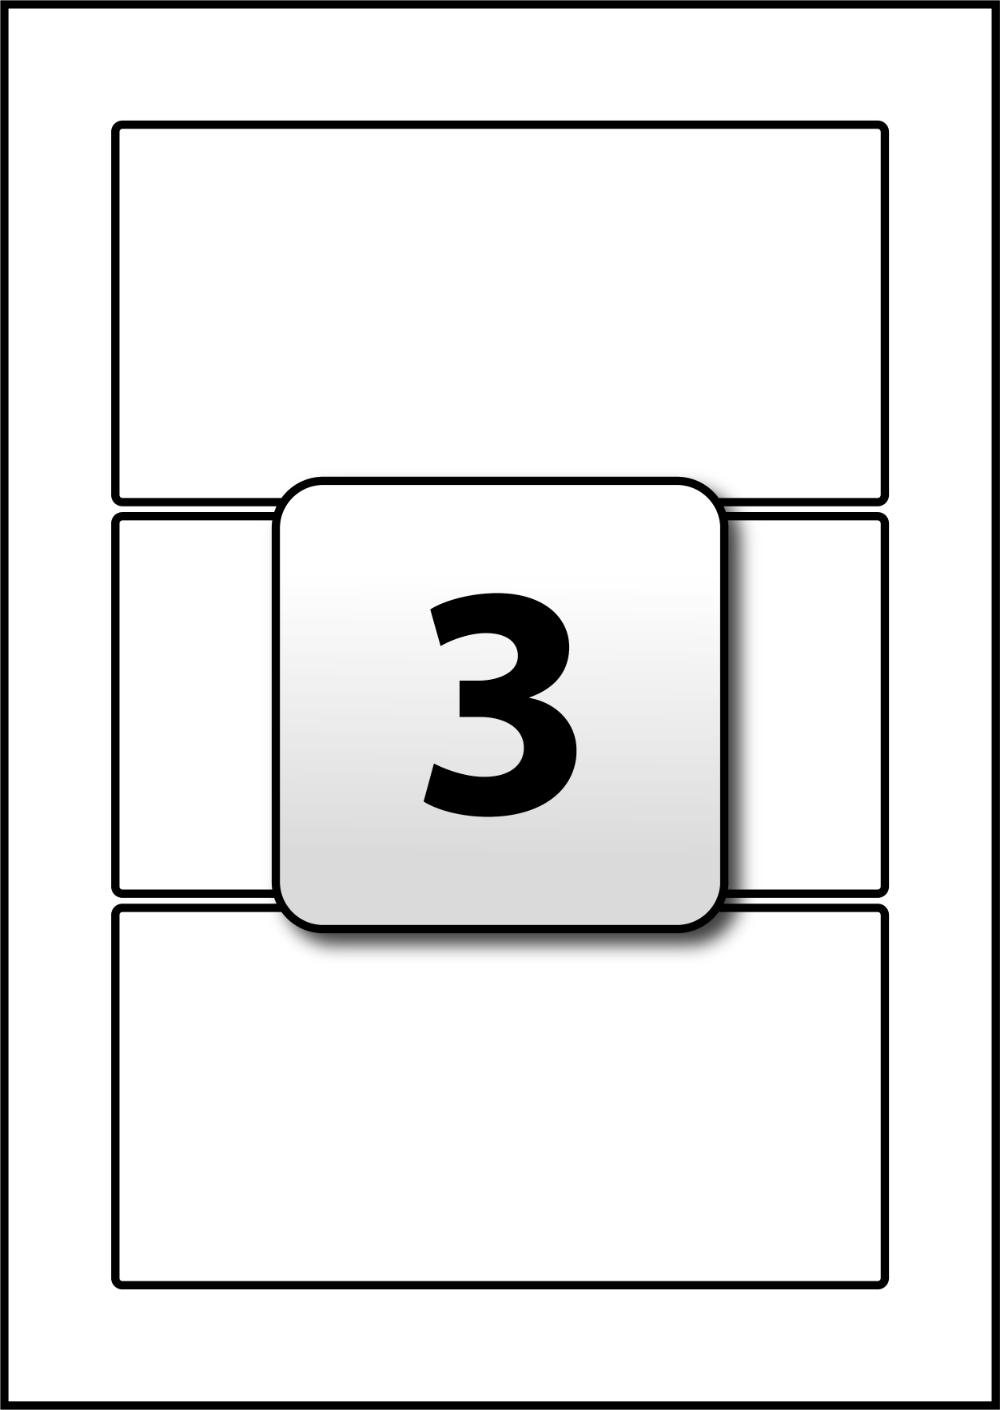 multipurpose labels per a sheet mm x mm flexi labels inside 8 x 3 label template